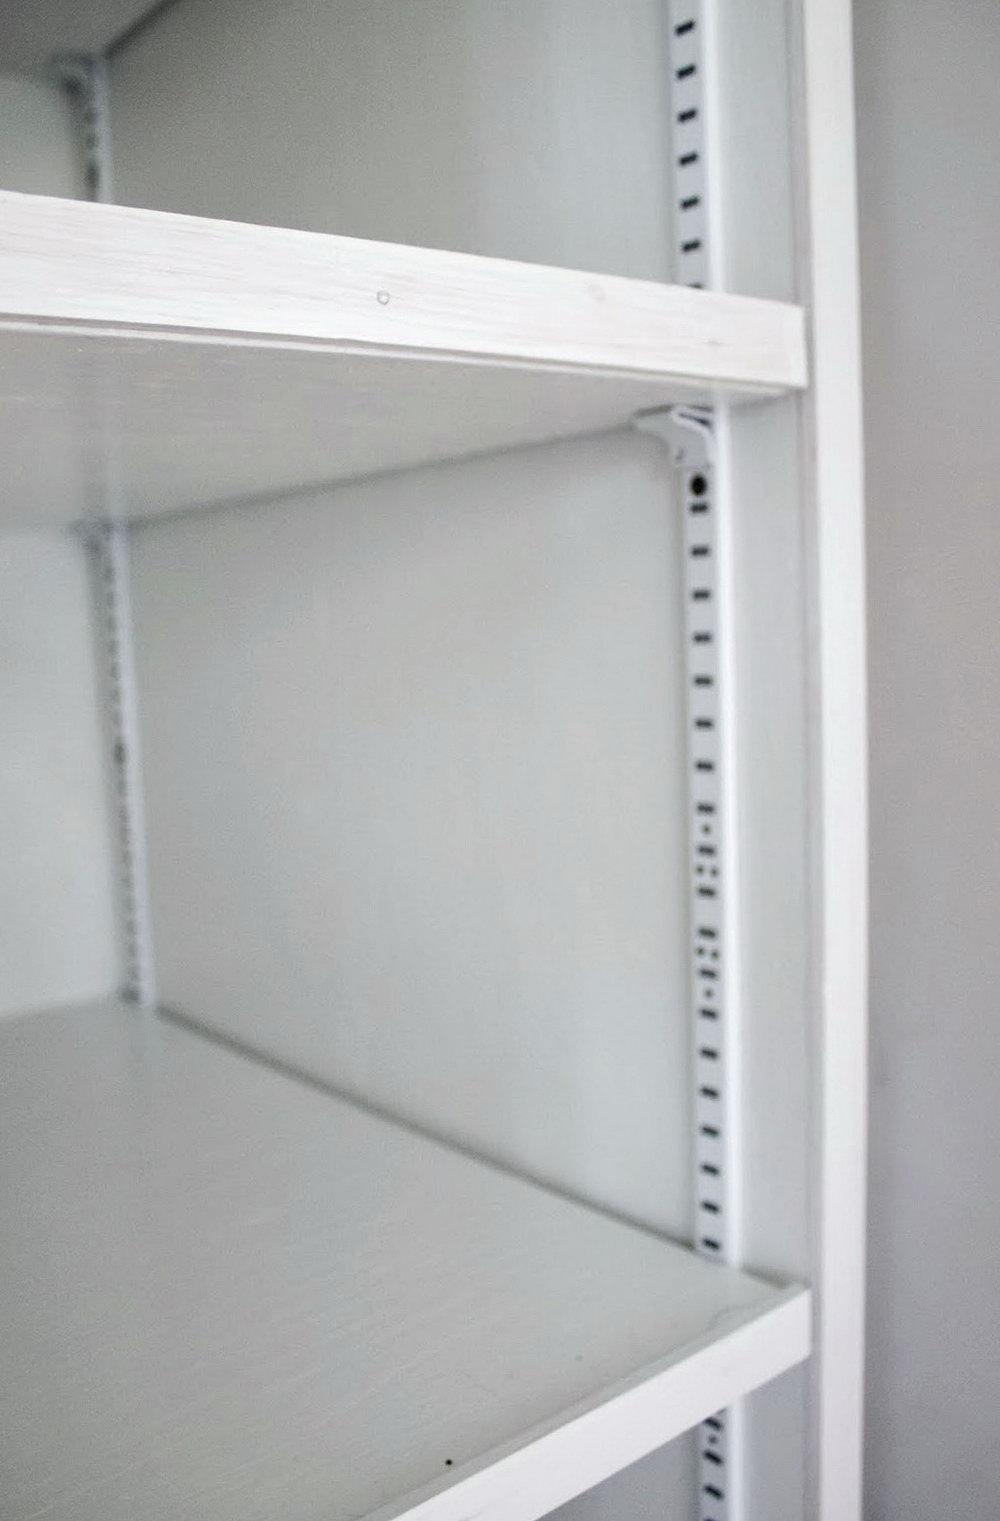 Rubbermaid Fasttrack Closet Installation Instructions